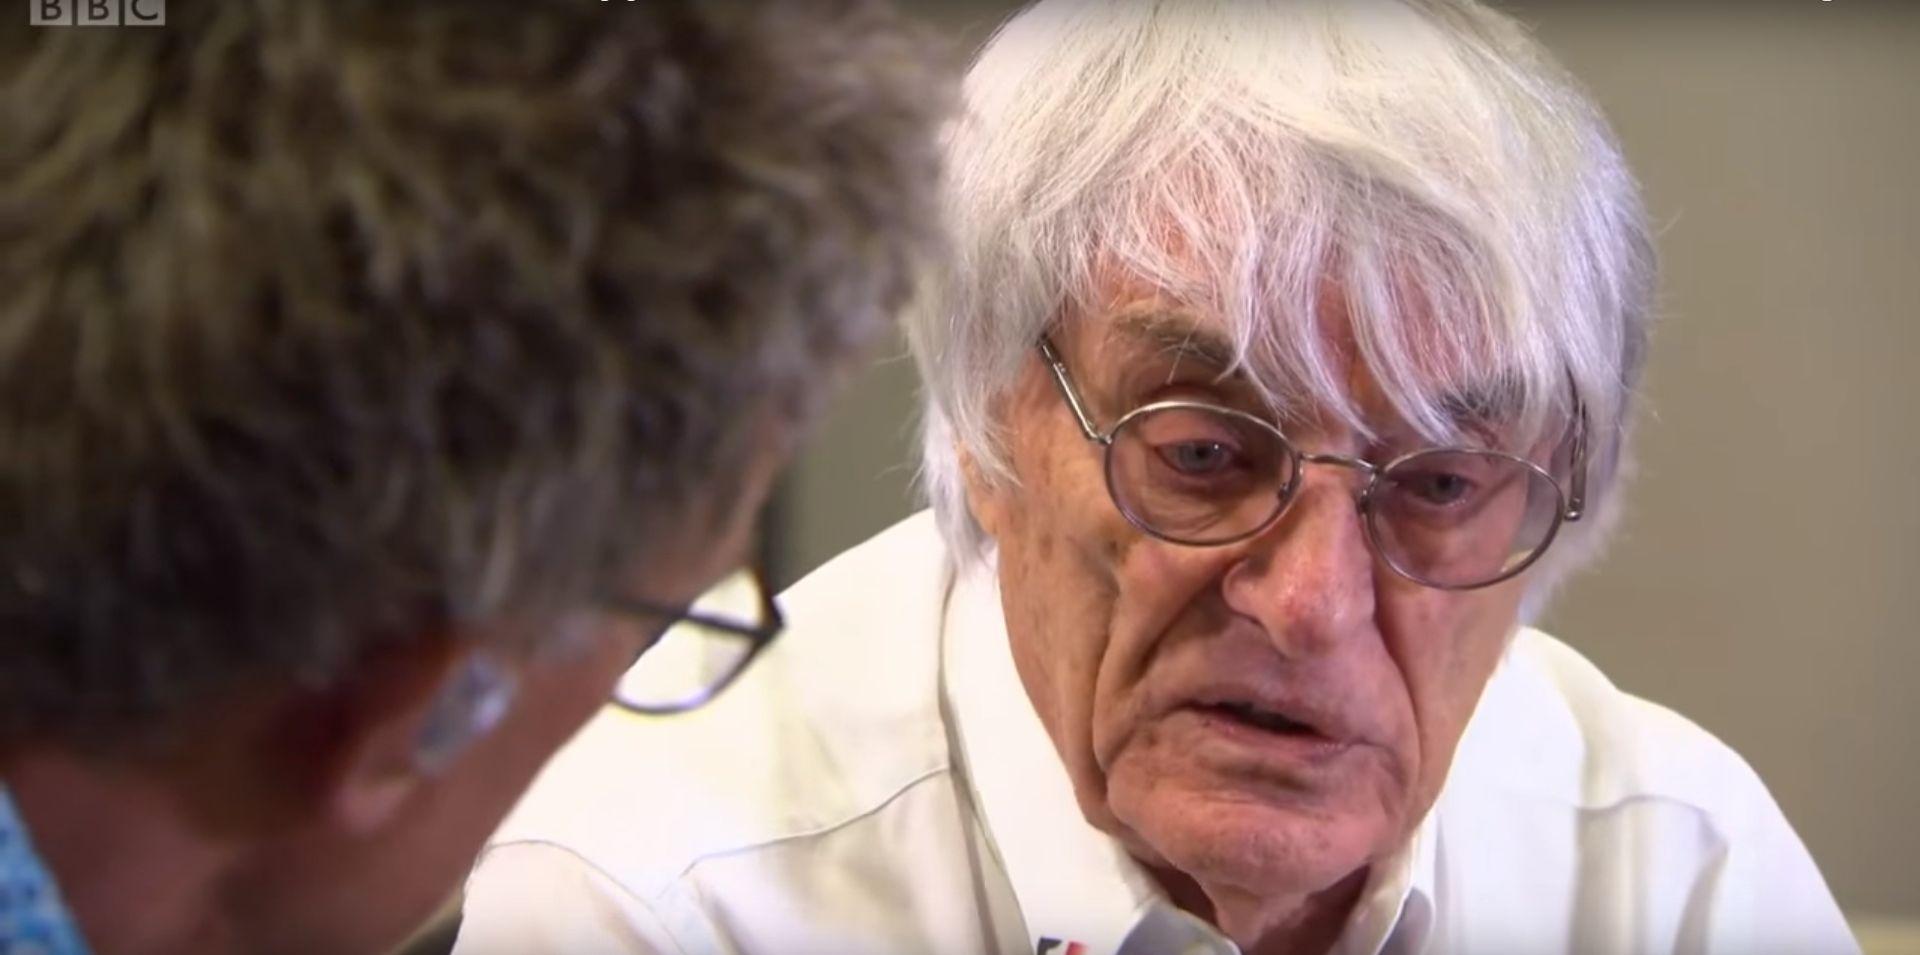 BRAZILSKI MEDIJI U Sao Paulu oteta punica Bernieja Ecclestonea